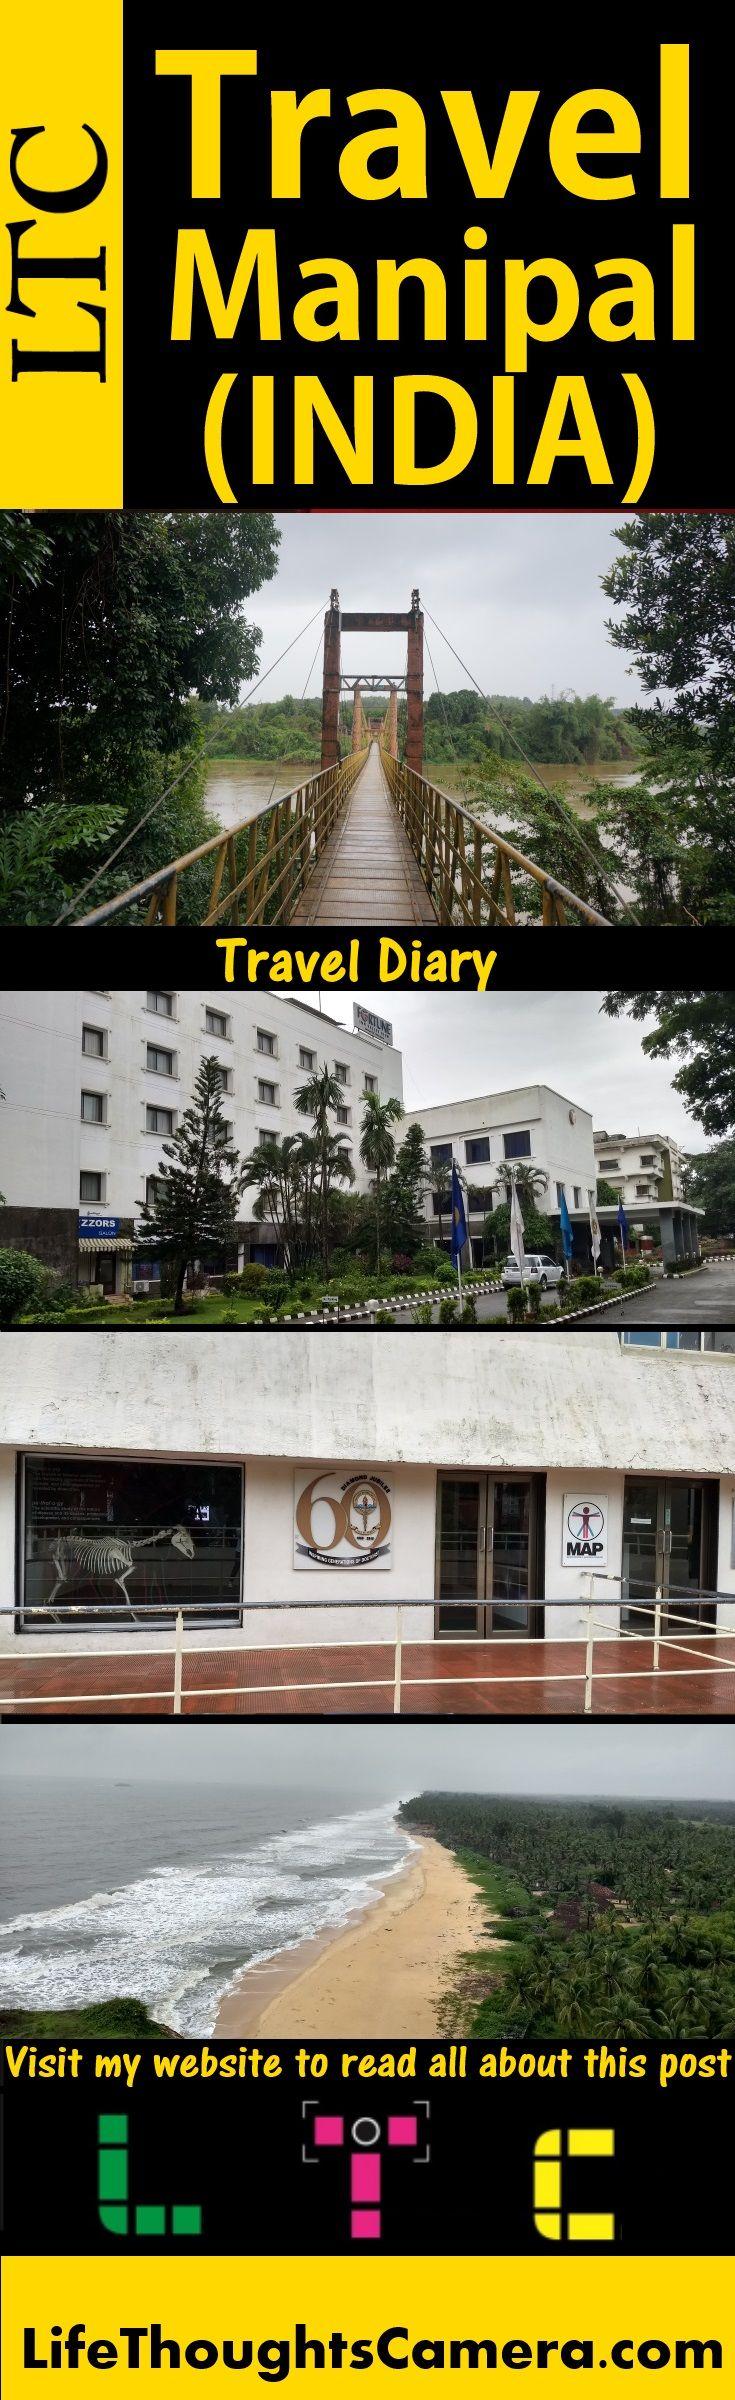 Travel Diary - Trip to Manipal in Karnataka (India) | LIFE THOUGHTS CAMERA .. .. .. .. .. #LifeThoughtsCamera  #travel #Manipal #INDIA #TravelWithLTC #TravelDiary #WhereToGo  #Bengaluru #Karnataka #SouthIndia #NorthIndia #BengaluruBlog #IndianBlog #LifeStyle #LifeStyleBlog #BengaluruLifeStyleBlog #IndianLifeStyleBlog #TravelBlog  #BengaluruTravelBlog #IndianTravelBlog #YouTube #YouTubeIndia #IndianYouTuber #Food #FoodBlog #BengaluruFoodBlog #IndianFoodBlog #ZoomCar #KapuBeach @pinwithfortune